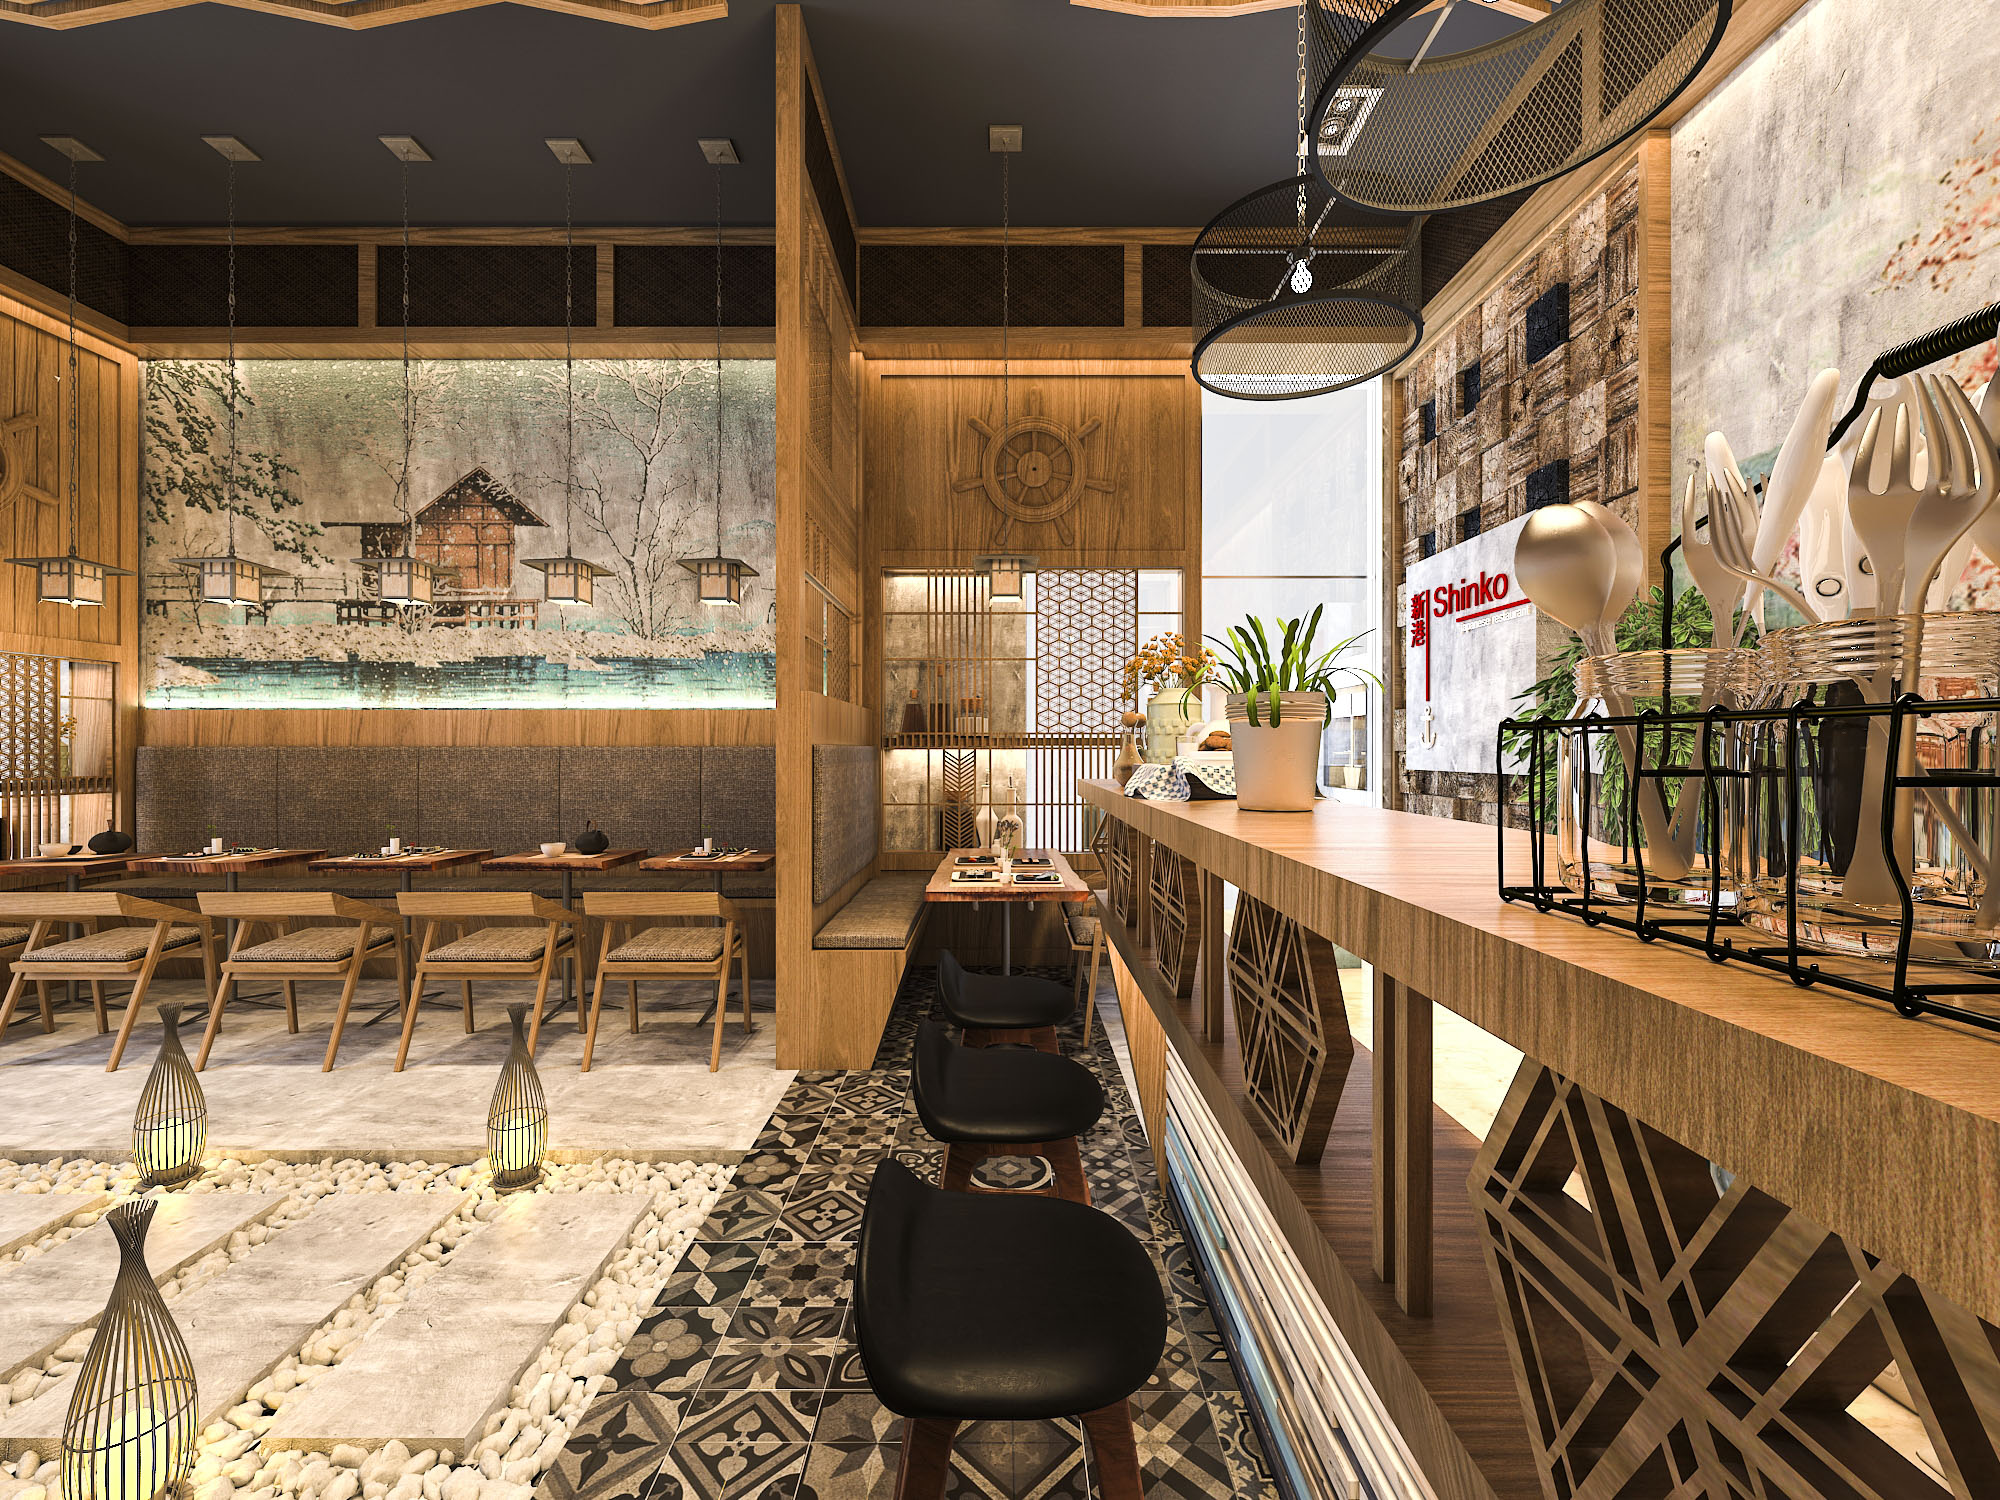 thiet-ke-noi-that-nha-hang-shinko-restaurant01